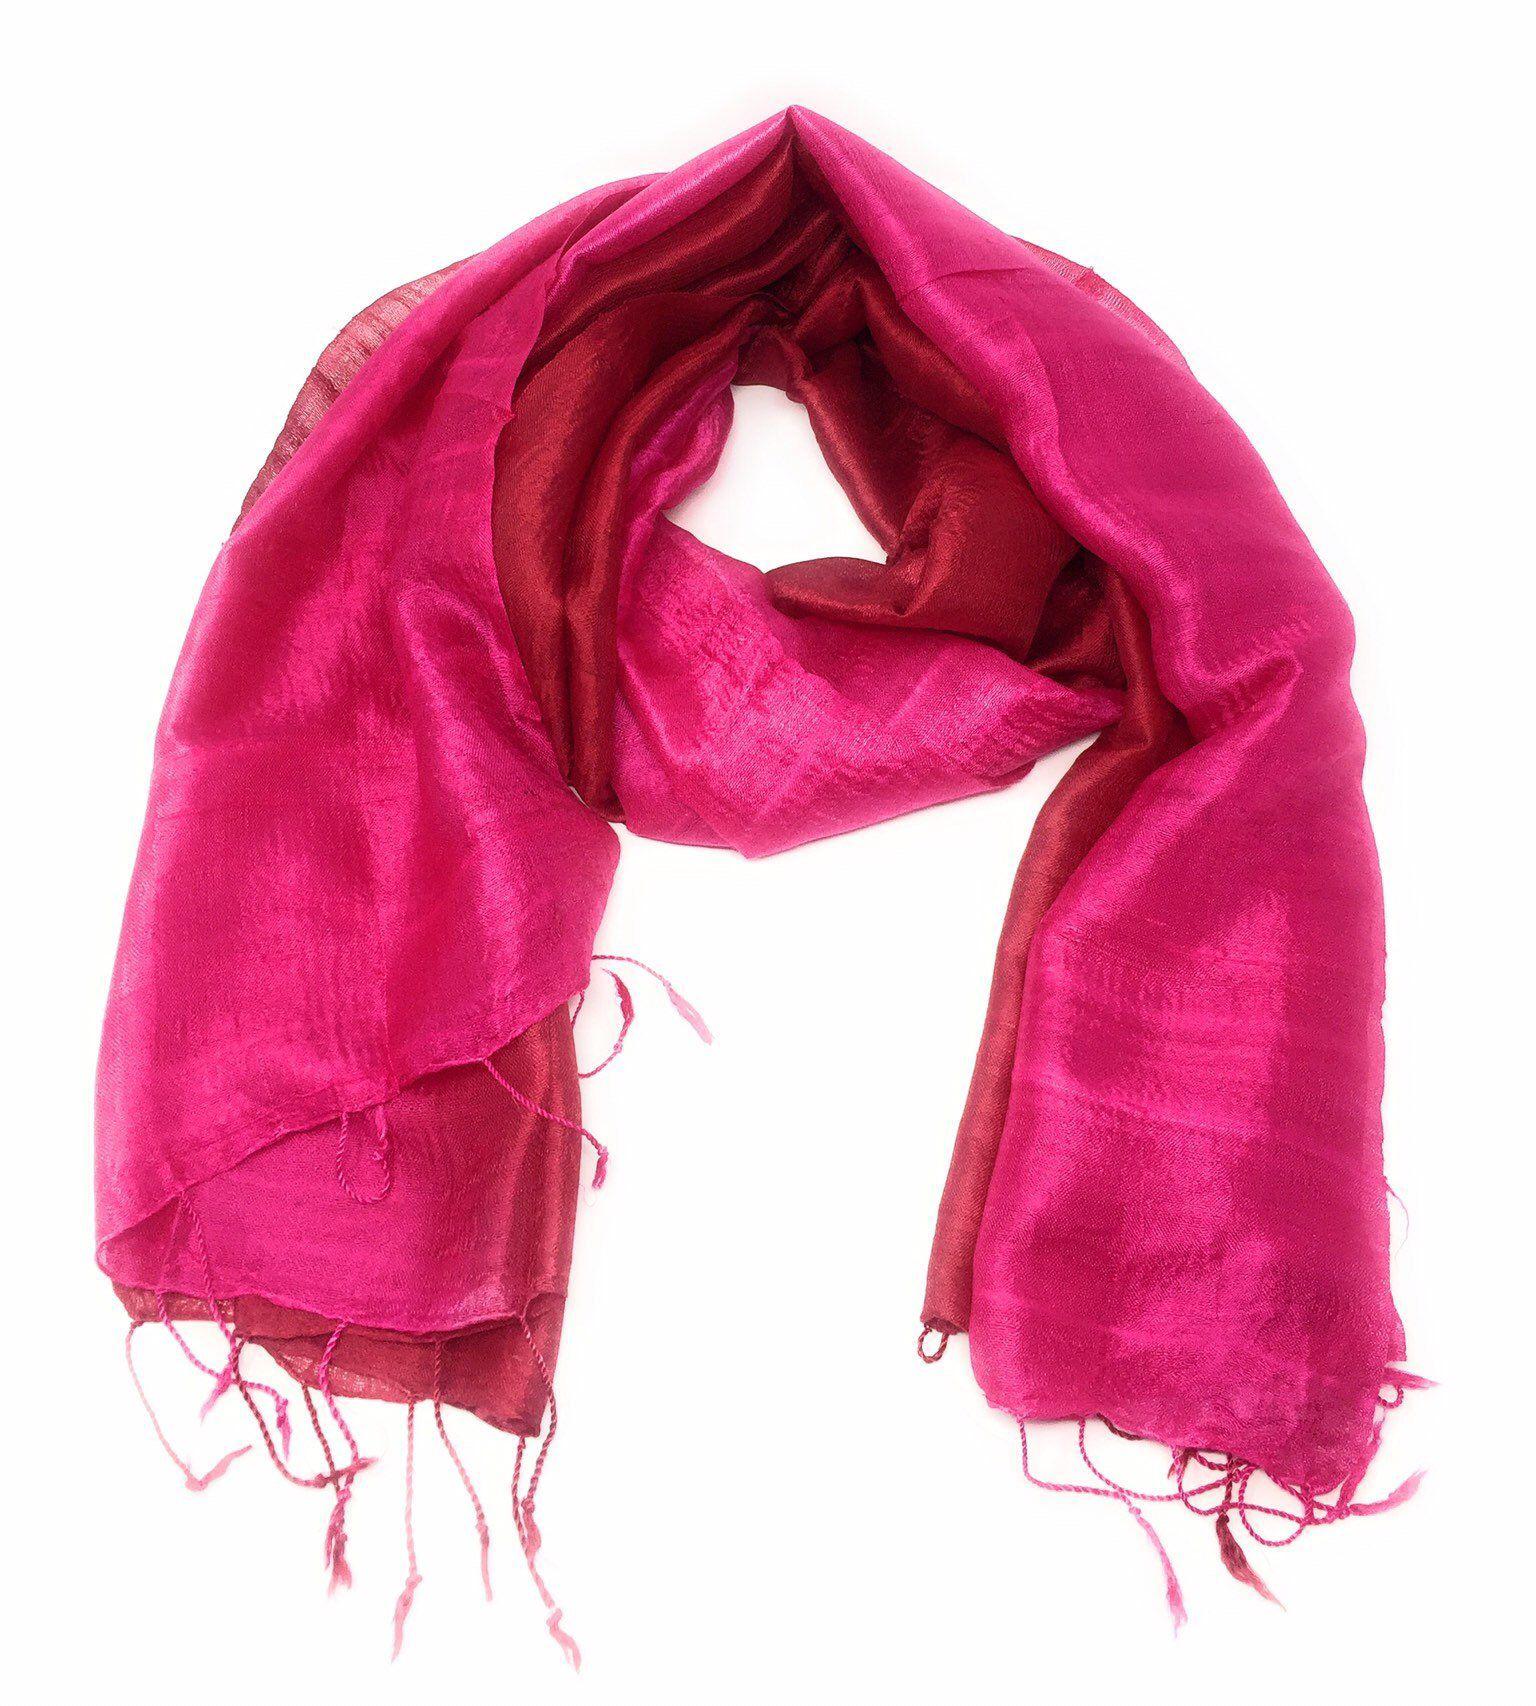 47c7b377480 Silk-Raw Silk-Shawl-Scarf-Wrap-Hijab-Soft-delicate-gift-Pashmina ...